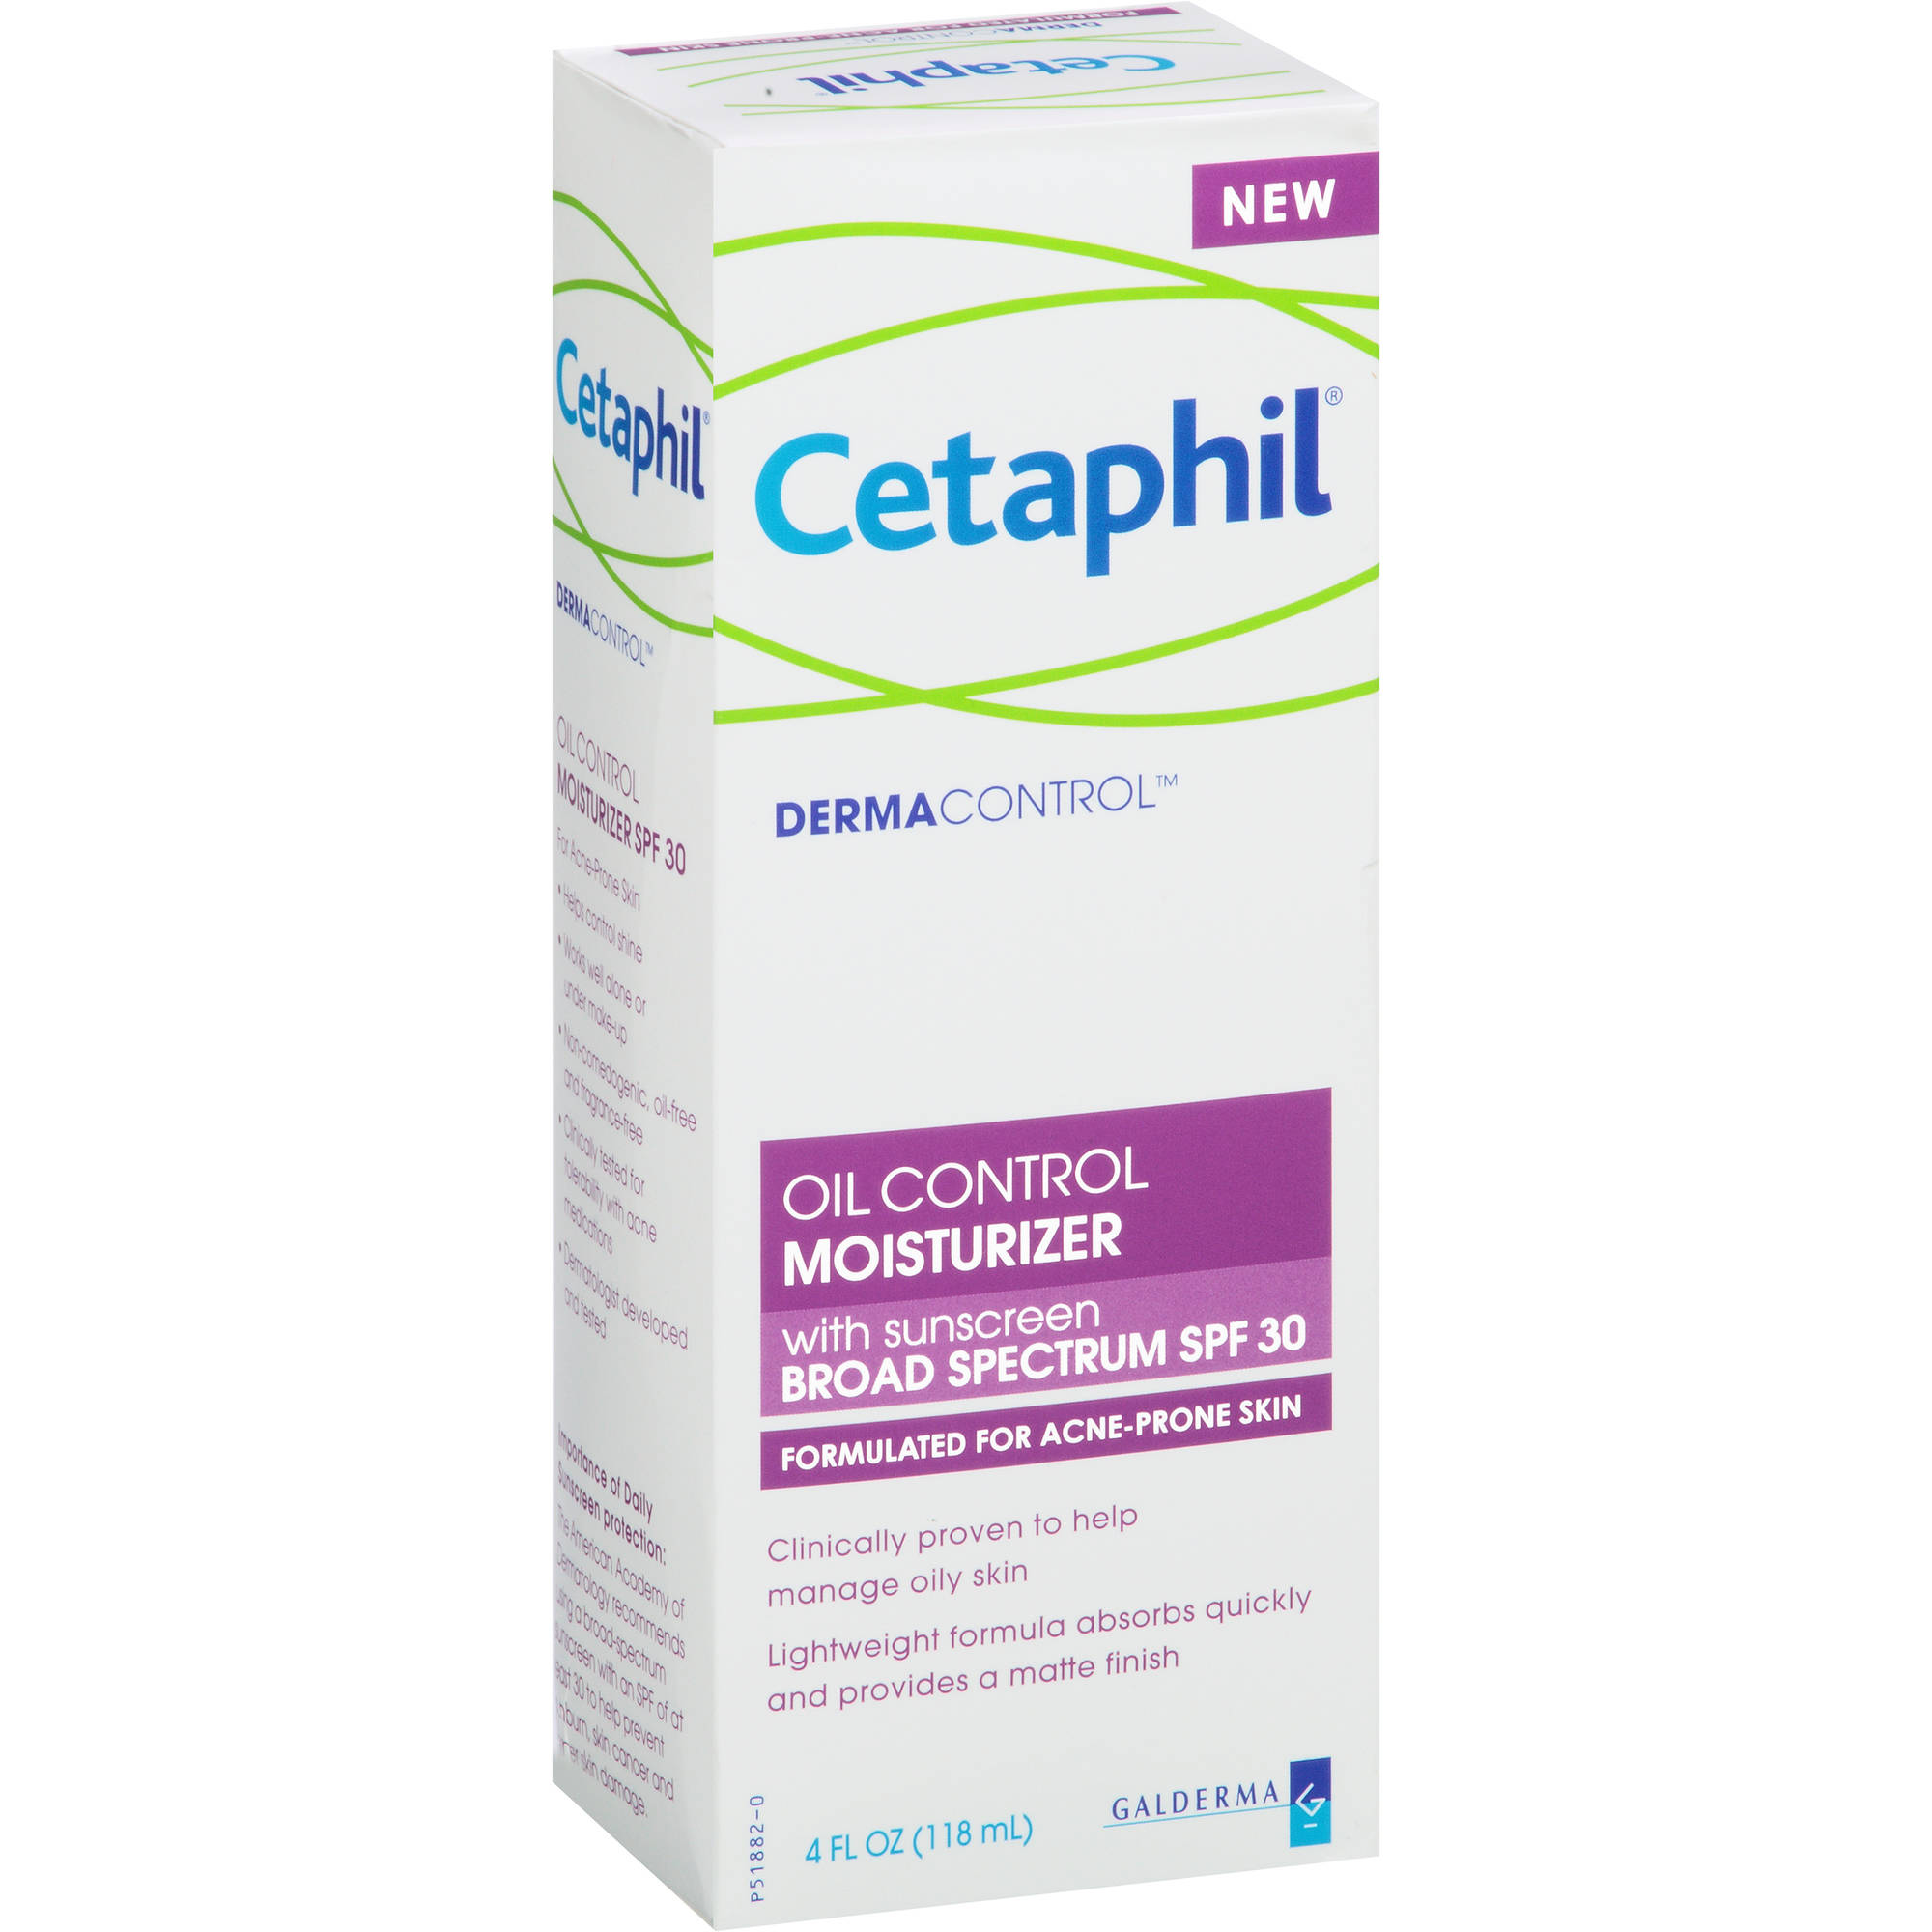 Cetaphil DermaControl Oil Control SPF 30 Moisturizer, 4 oz